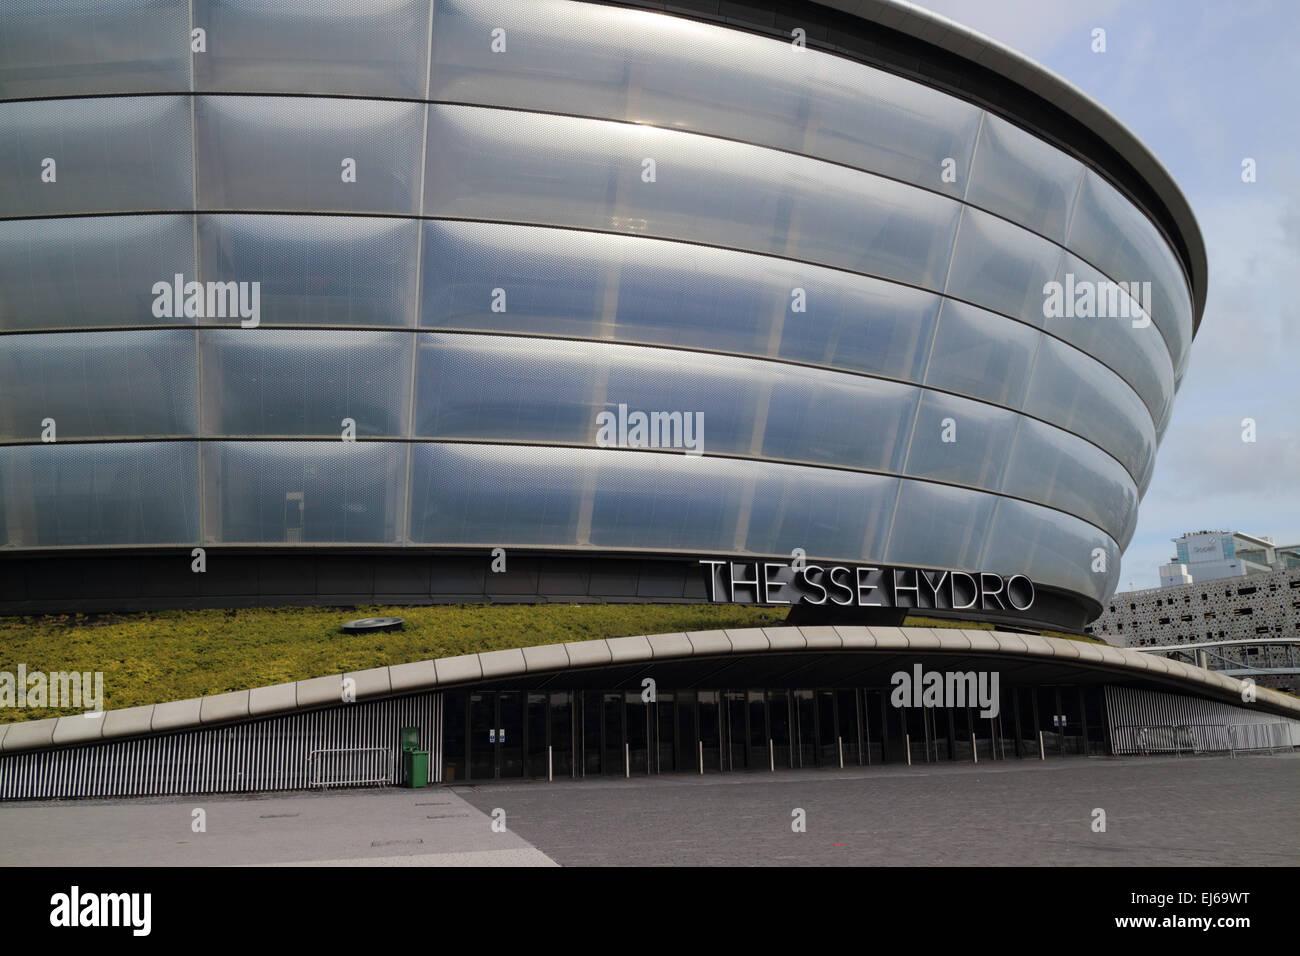 SSE hydro arena secc Glasgow Scotland uk - Stock Image